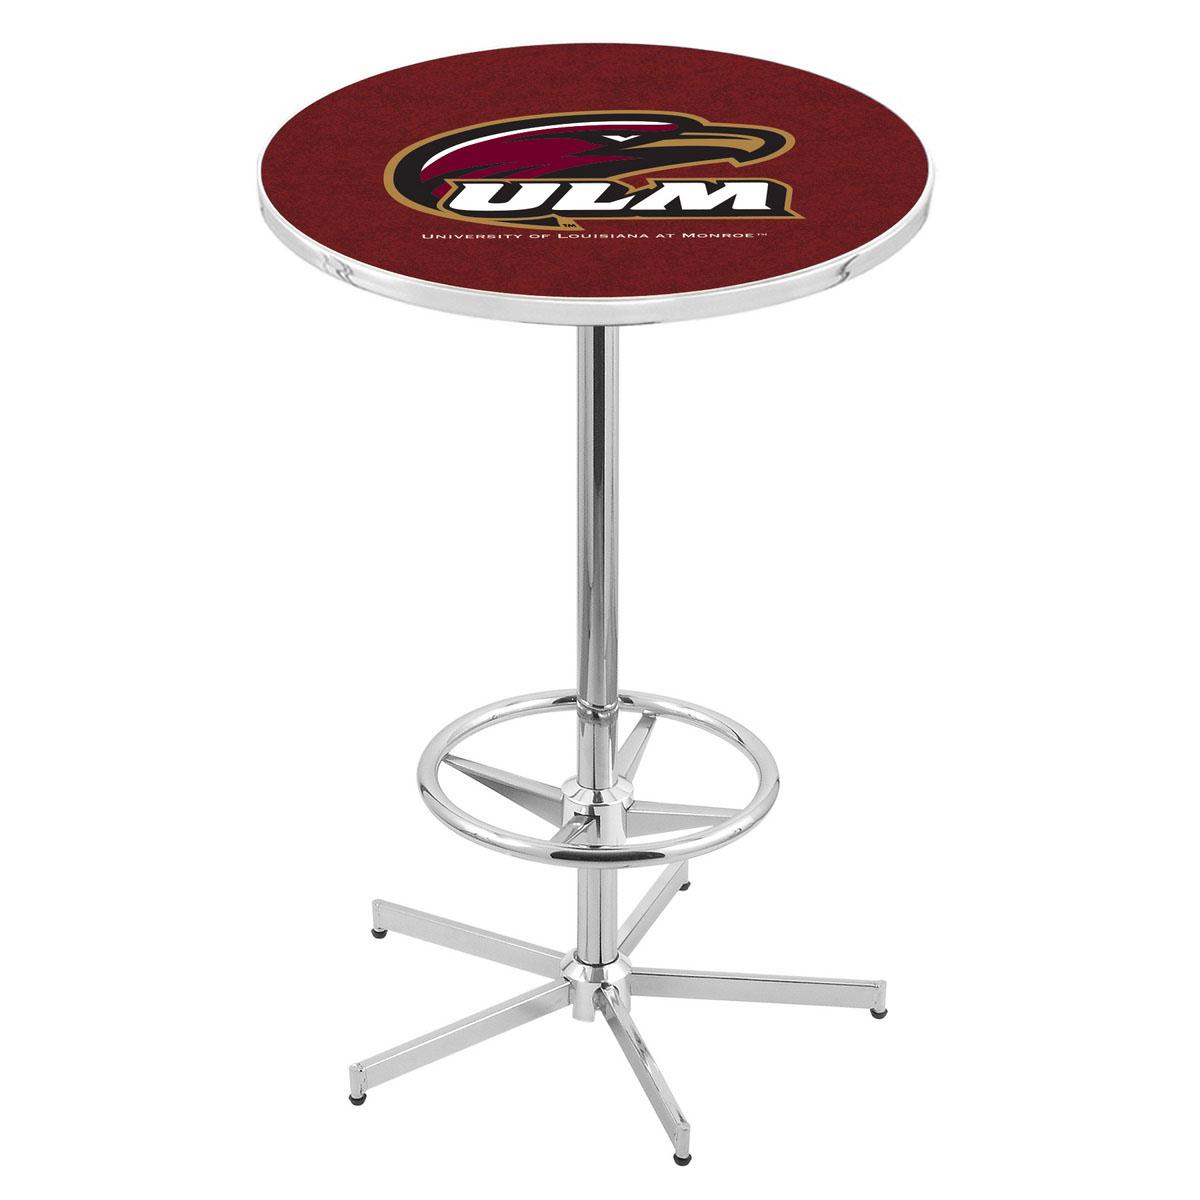 Serious Chrome Louisiana Monroe Pub Table Product Photo